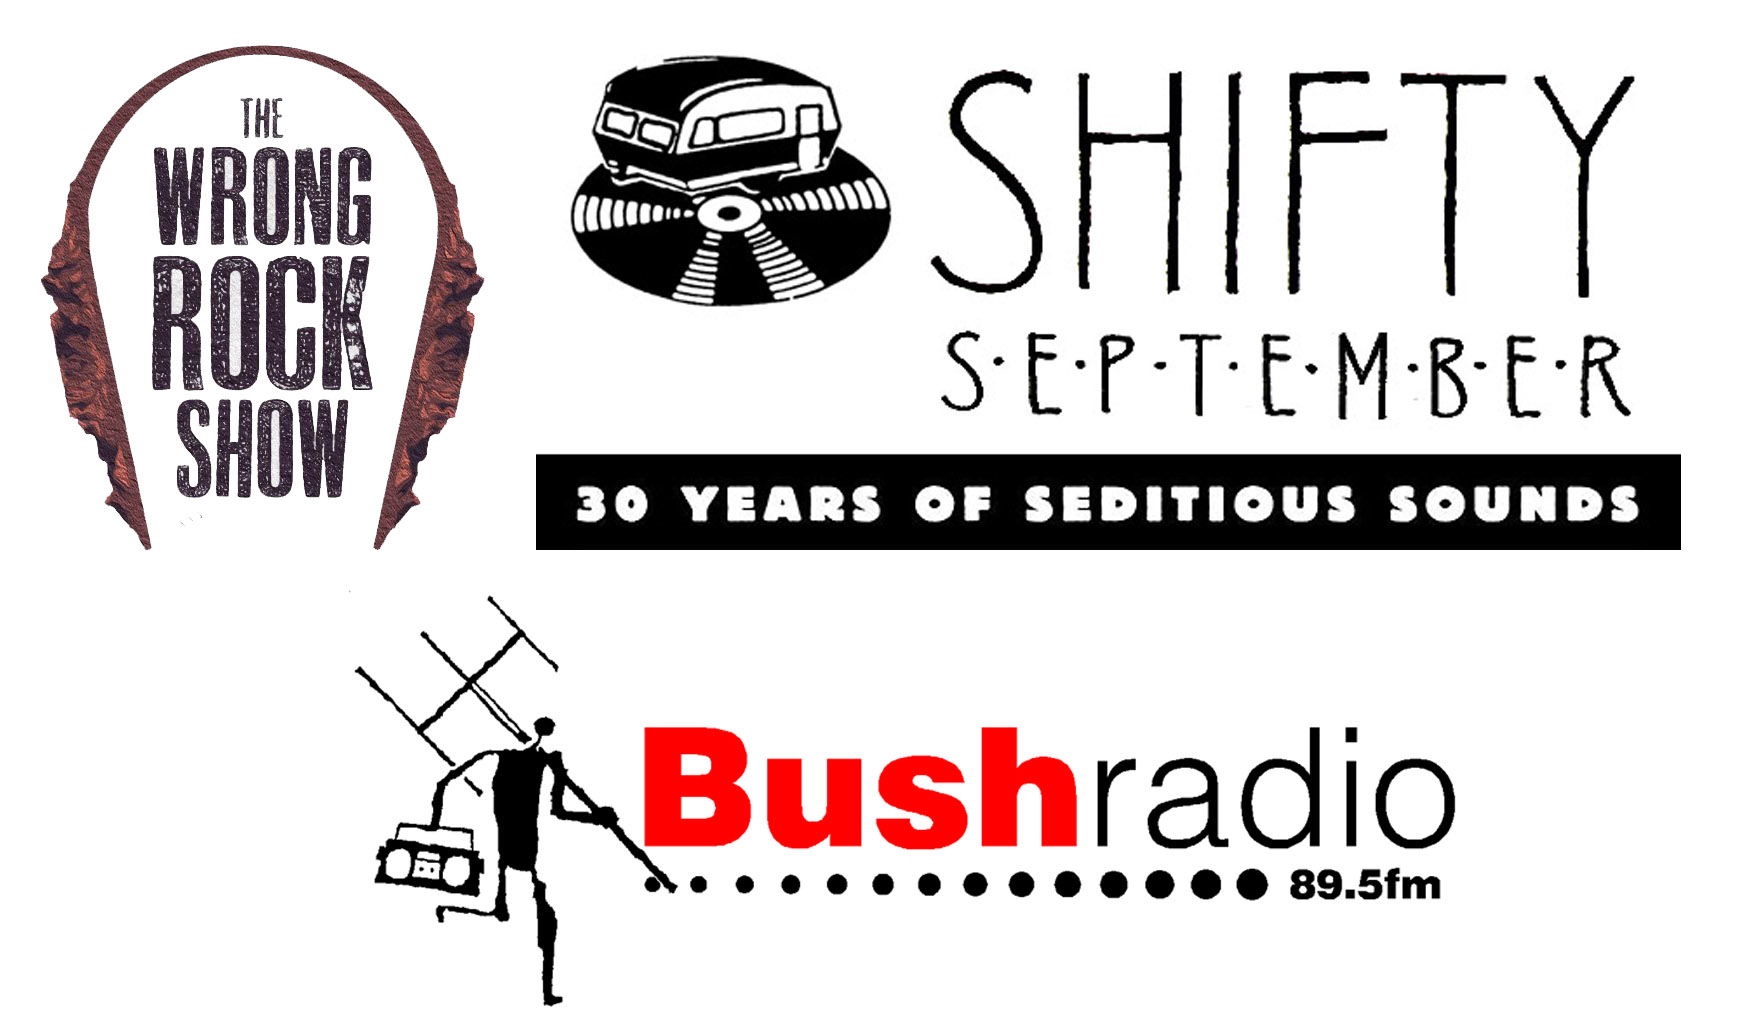 shifty bush wrs